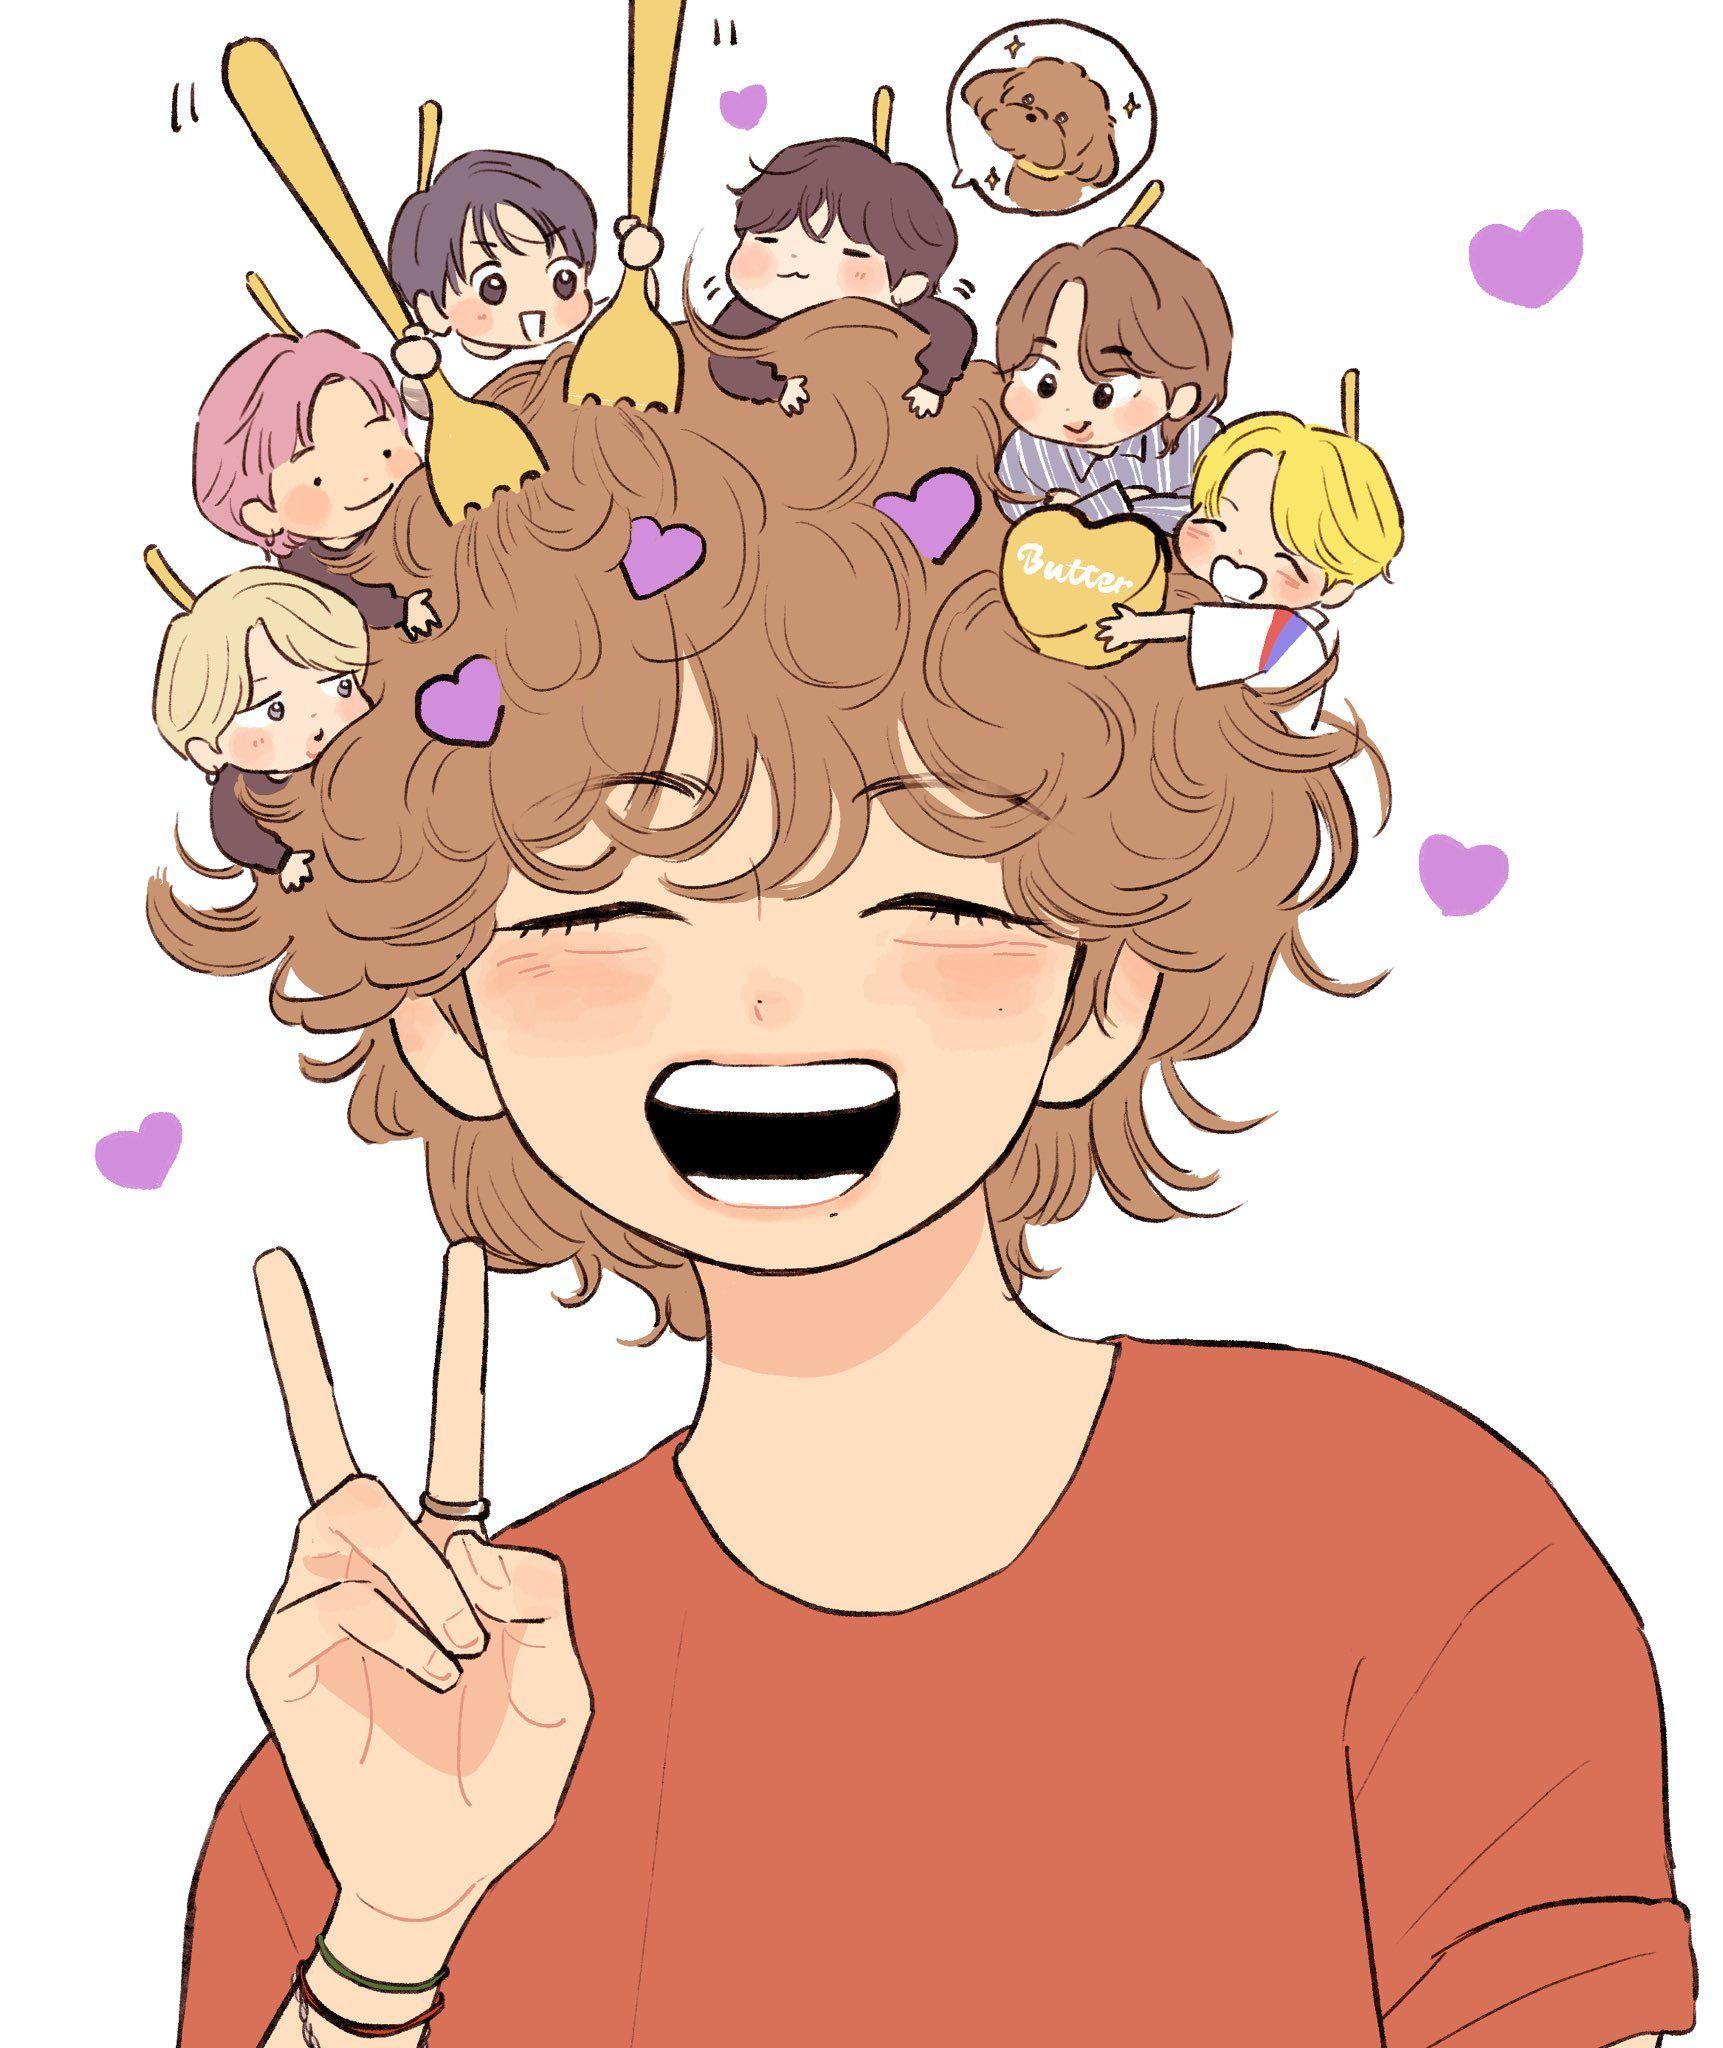 Photo of 湯 on Twitter